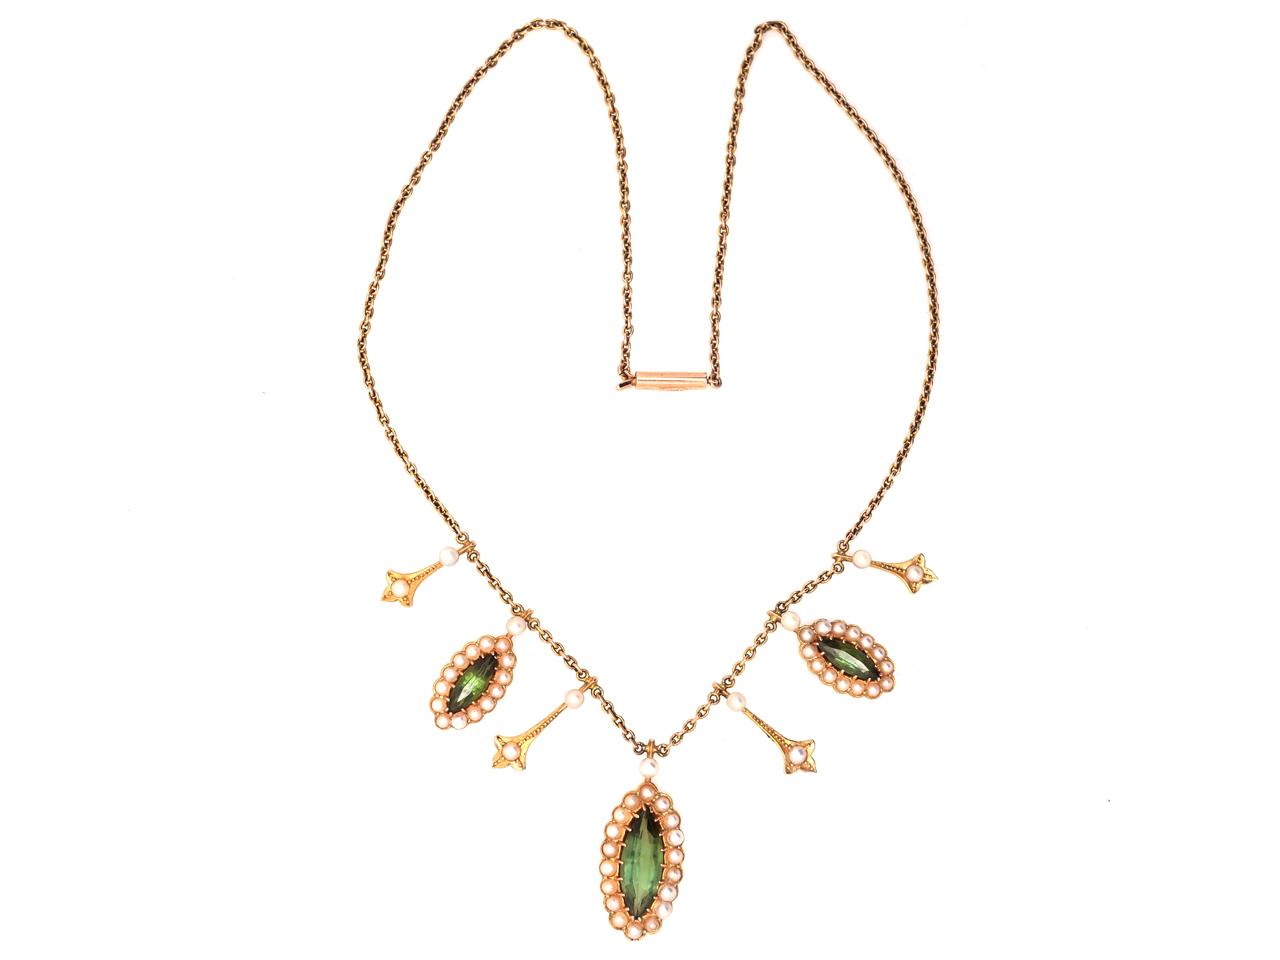 Edwardian 15ct Gold, Green Tourmaline & Natural Split Pearls Necklace